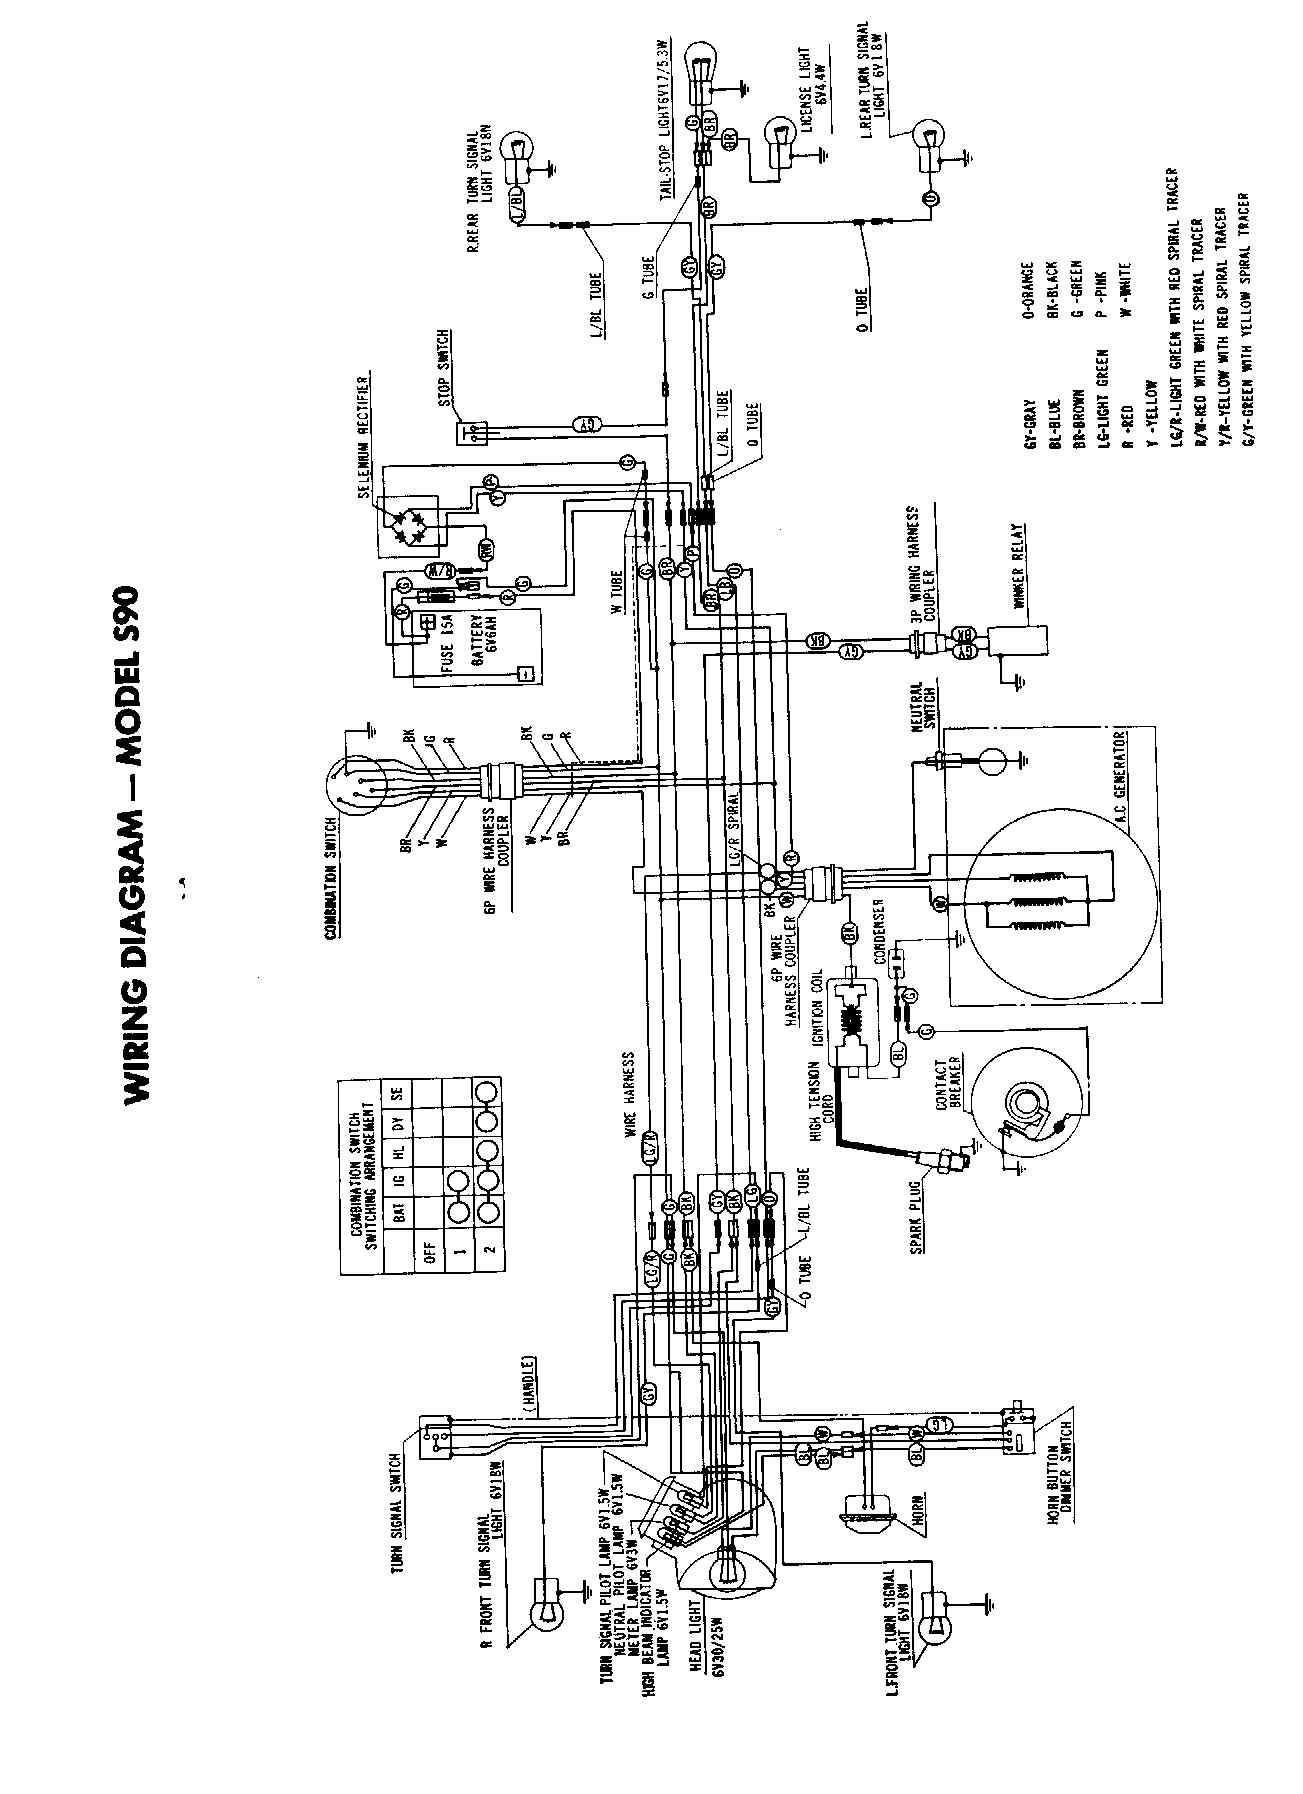 Wiring Diagram Honda Bf50